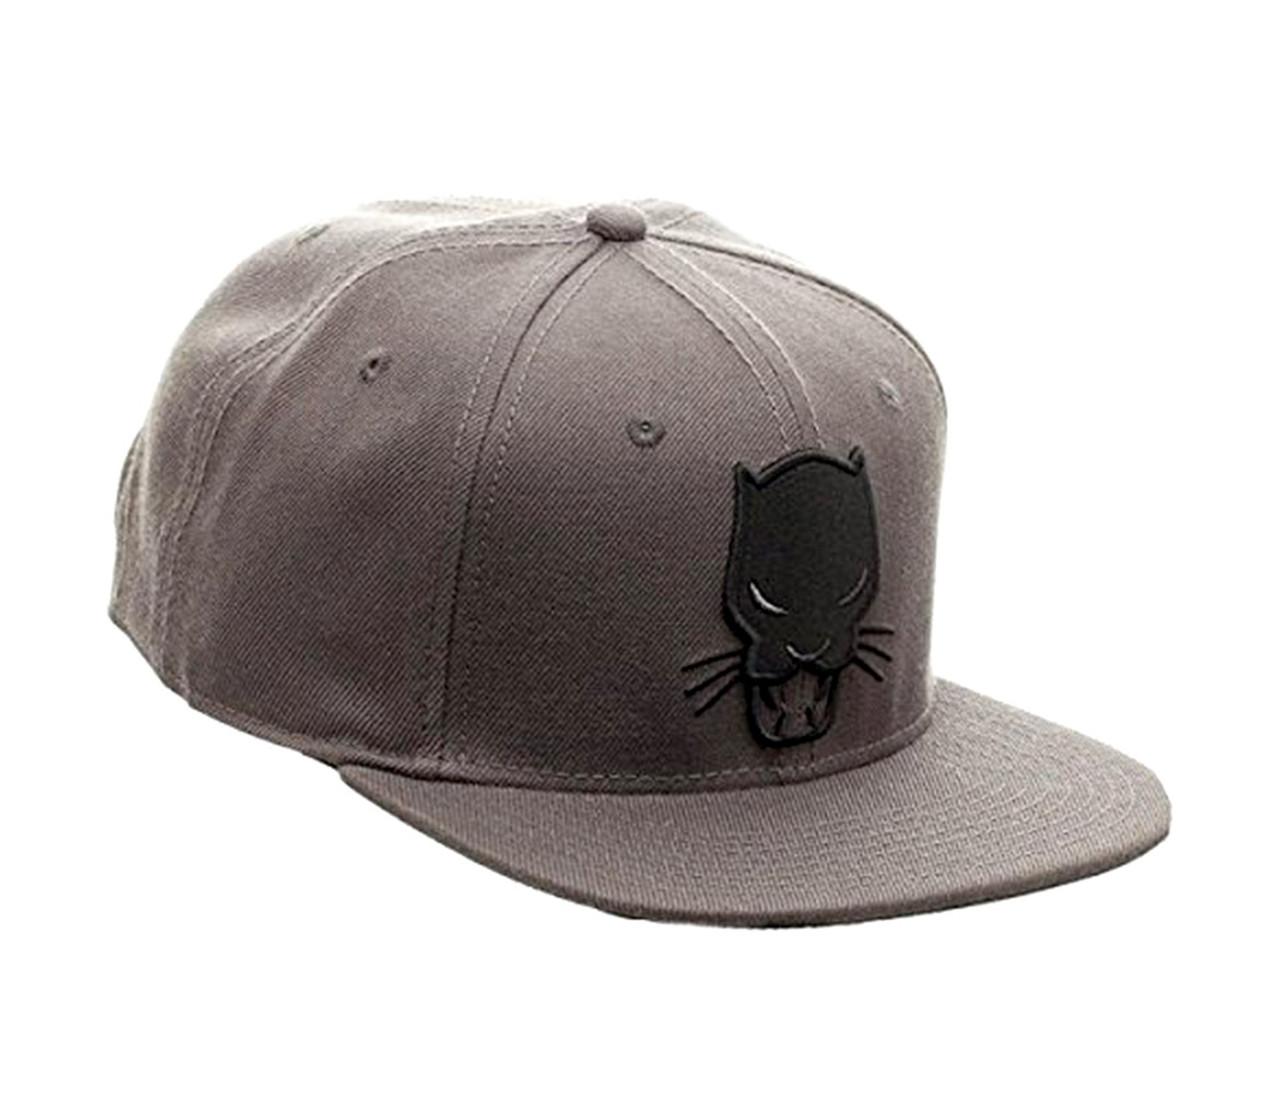 65957296 Bioworld Marvel Comics Black Panther Grey Snapback Hat Novelty ...